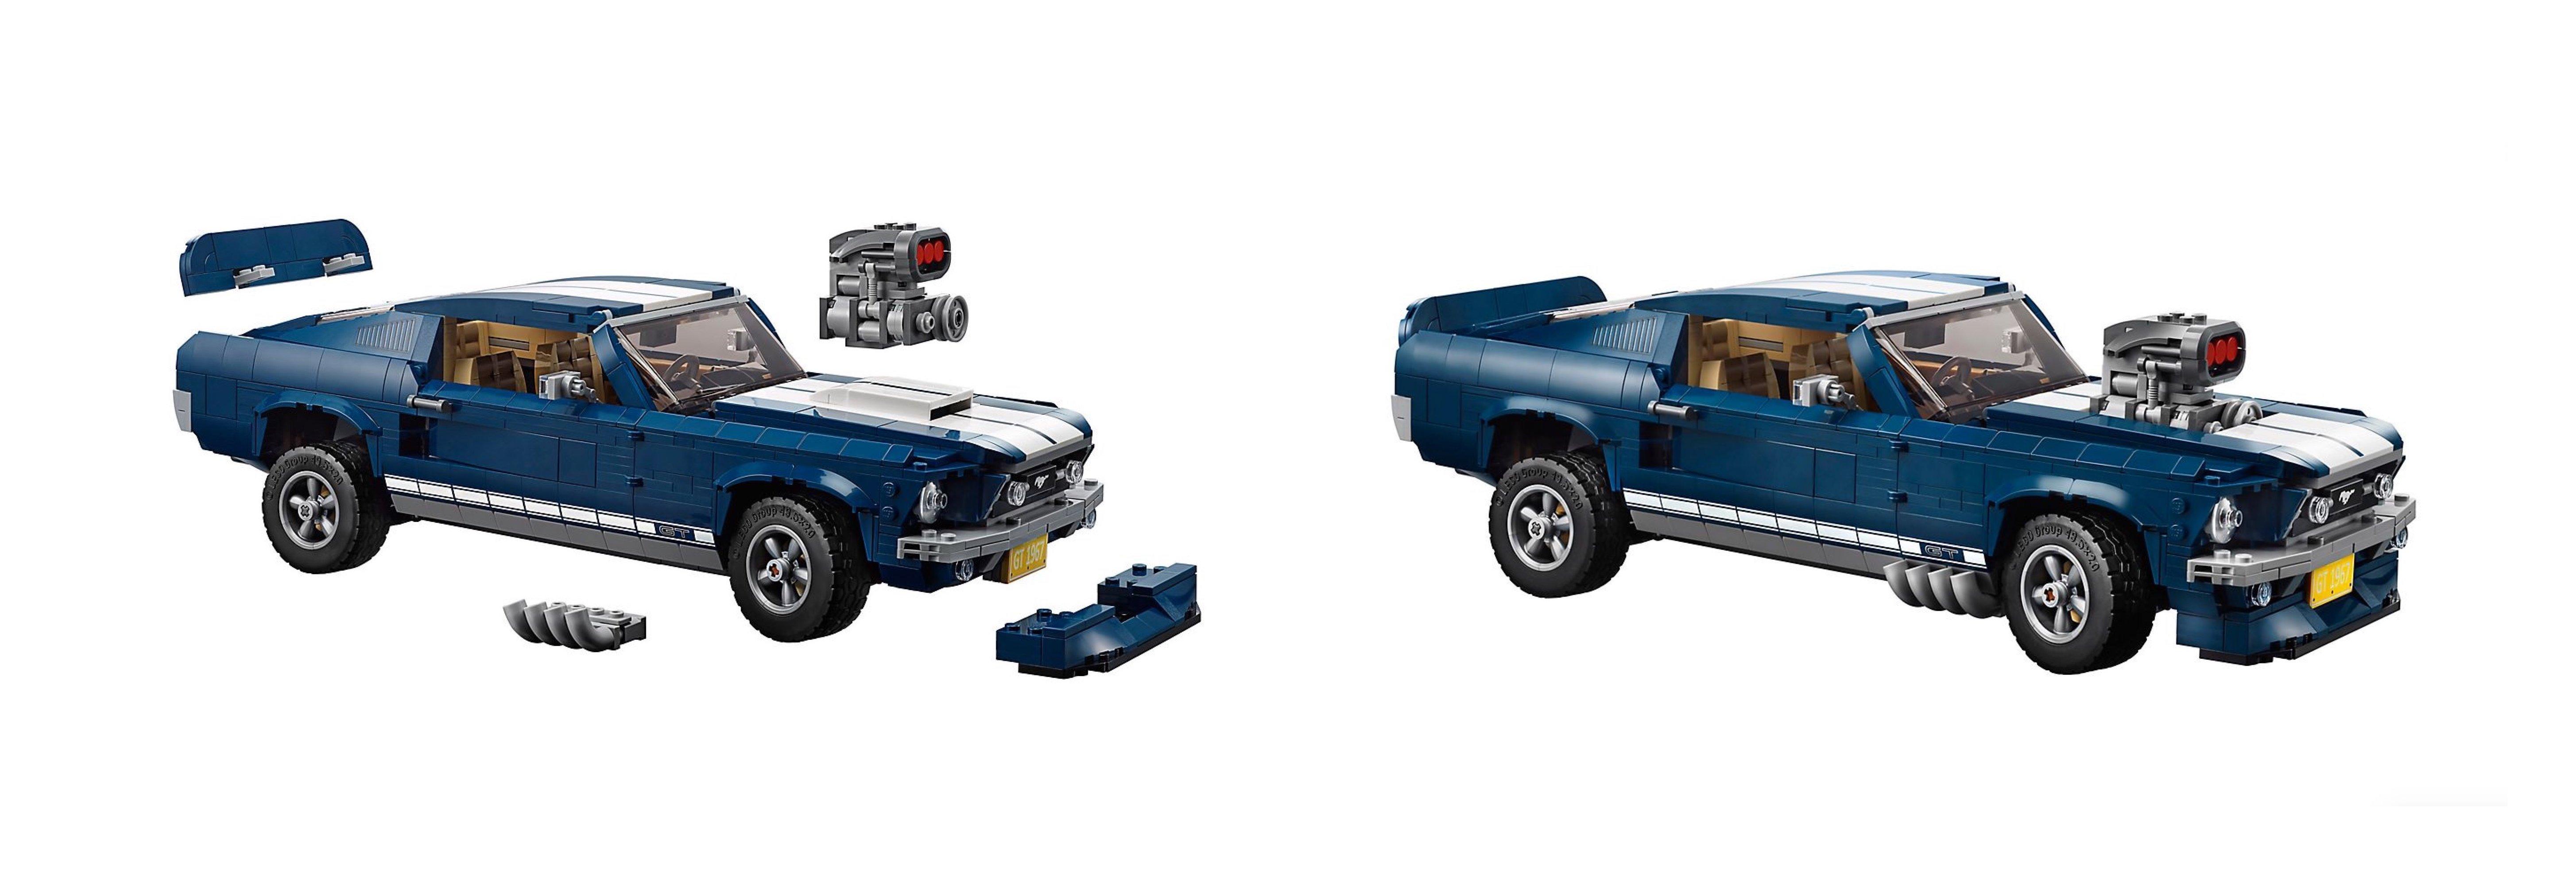 Lego Ford Mustang : lego 39 67 ford mustang fastback 1 471 parts 13 long usd ~ Aude.kayakingforconservation.com Haus und Dekorationen